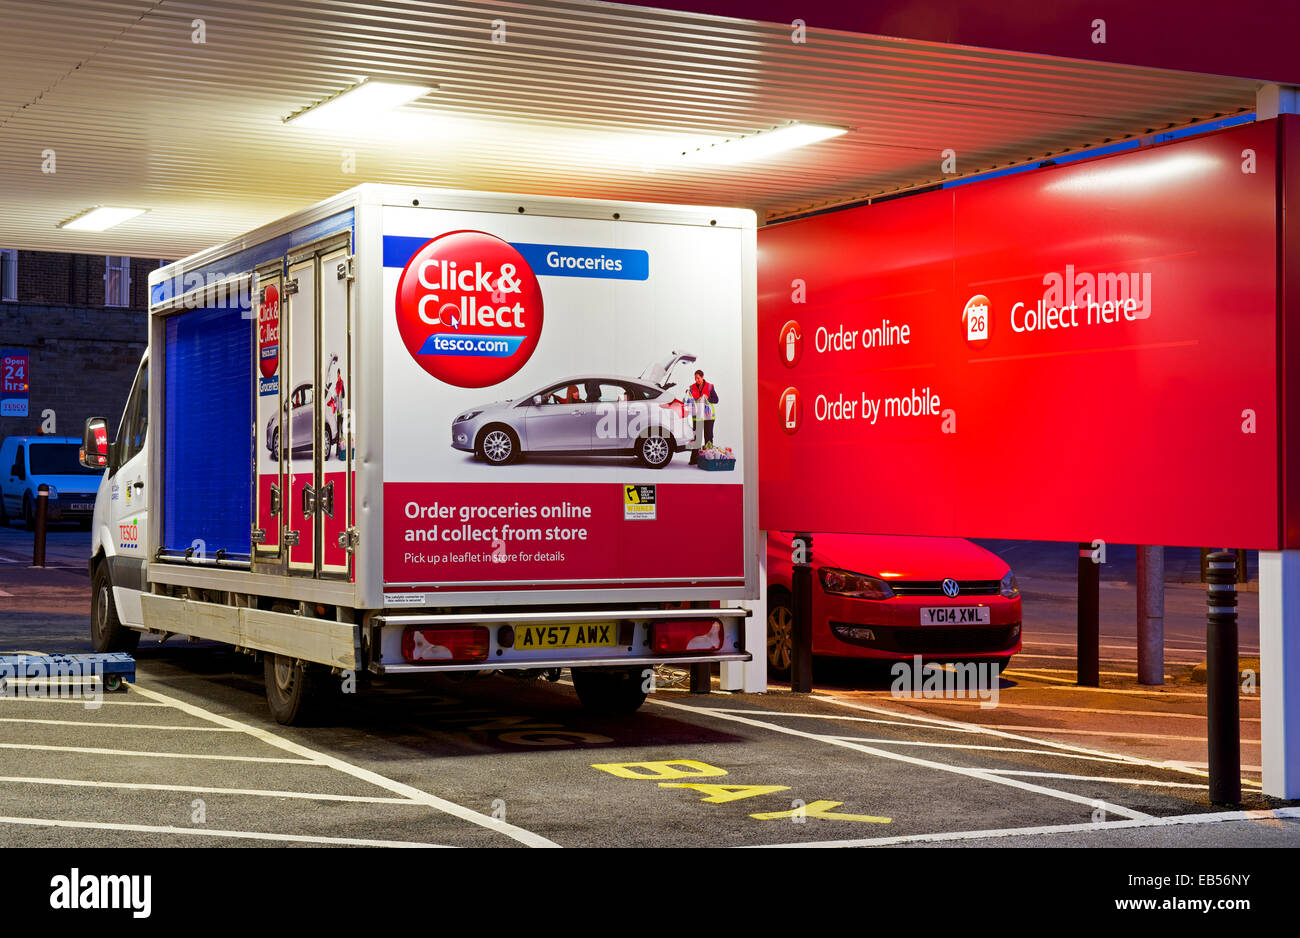 Tesco click & collect facility, Skipton, North Yorkshire, England UK - Stock Image